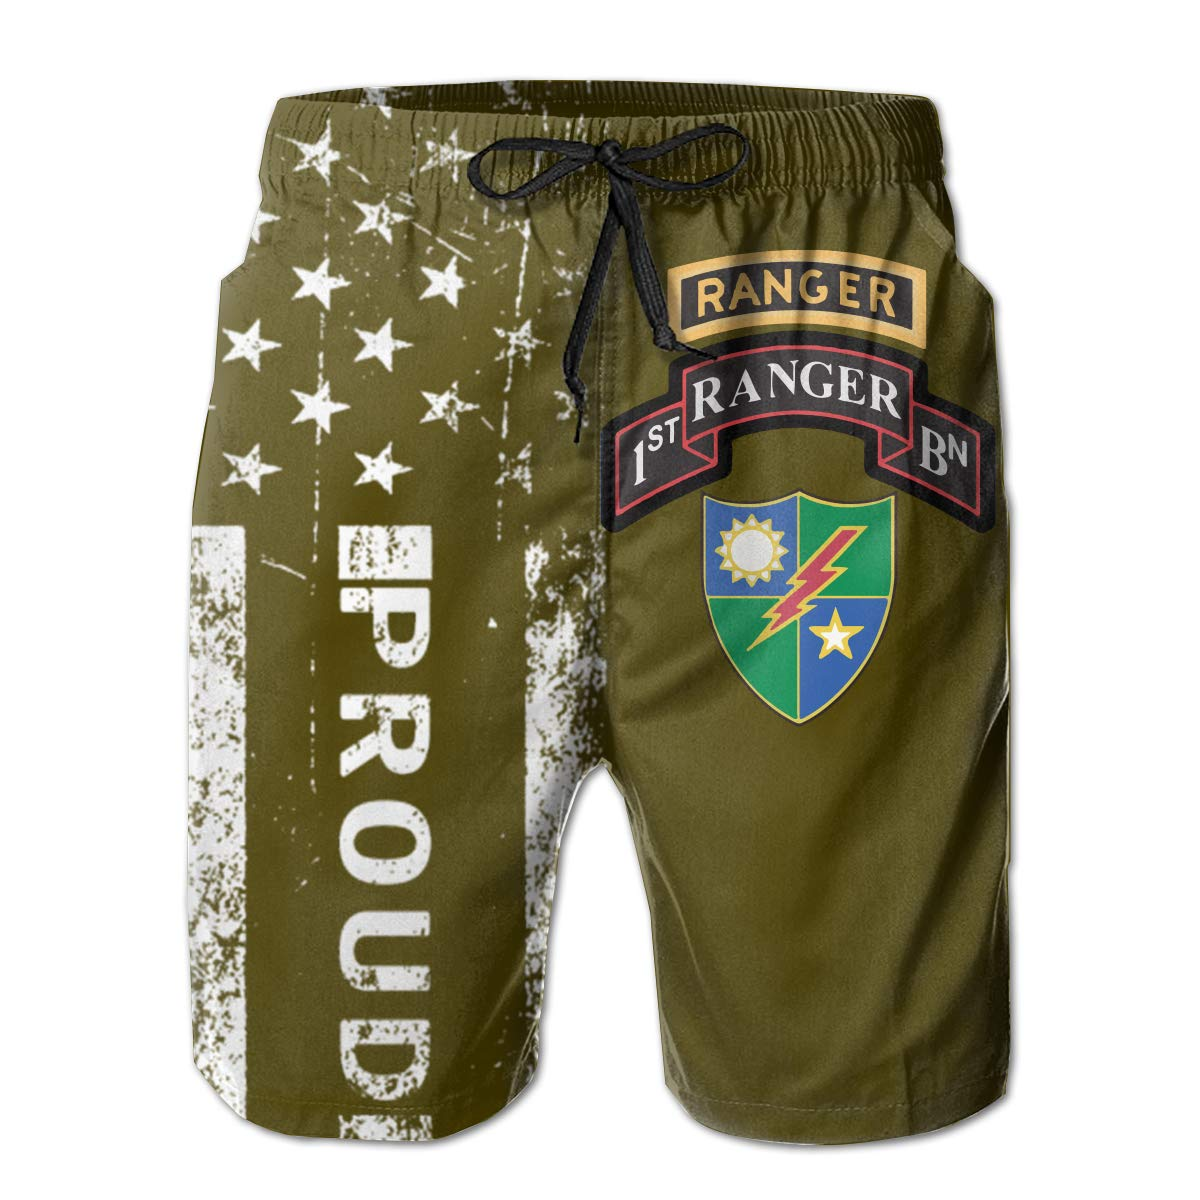 SUNSUNNY 1st Battalion 75th Ranger Regiment Mens Boardshorts Swim Trunks Beach Athletic Shorts